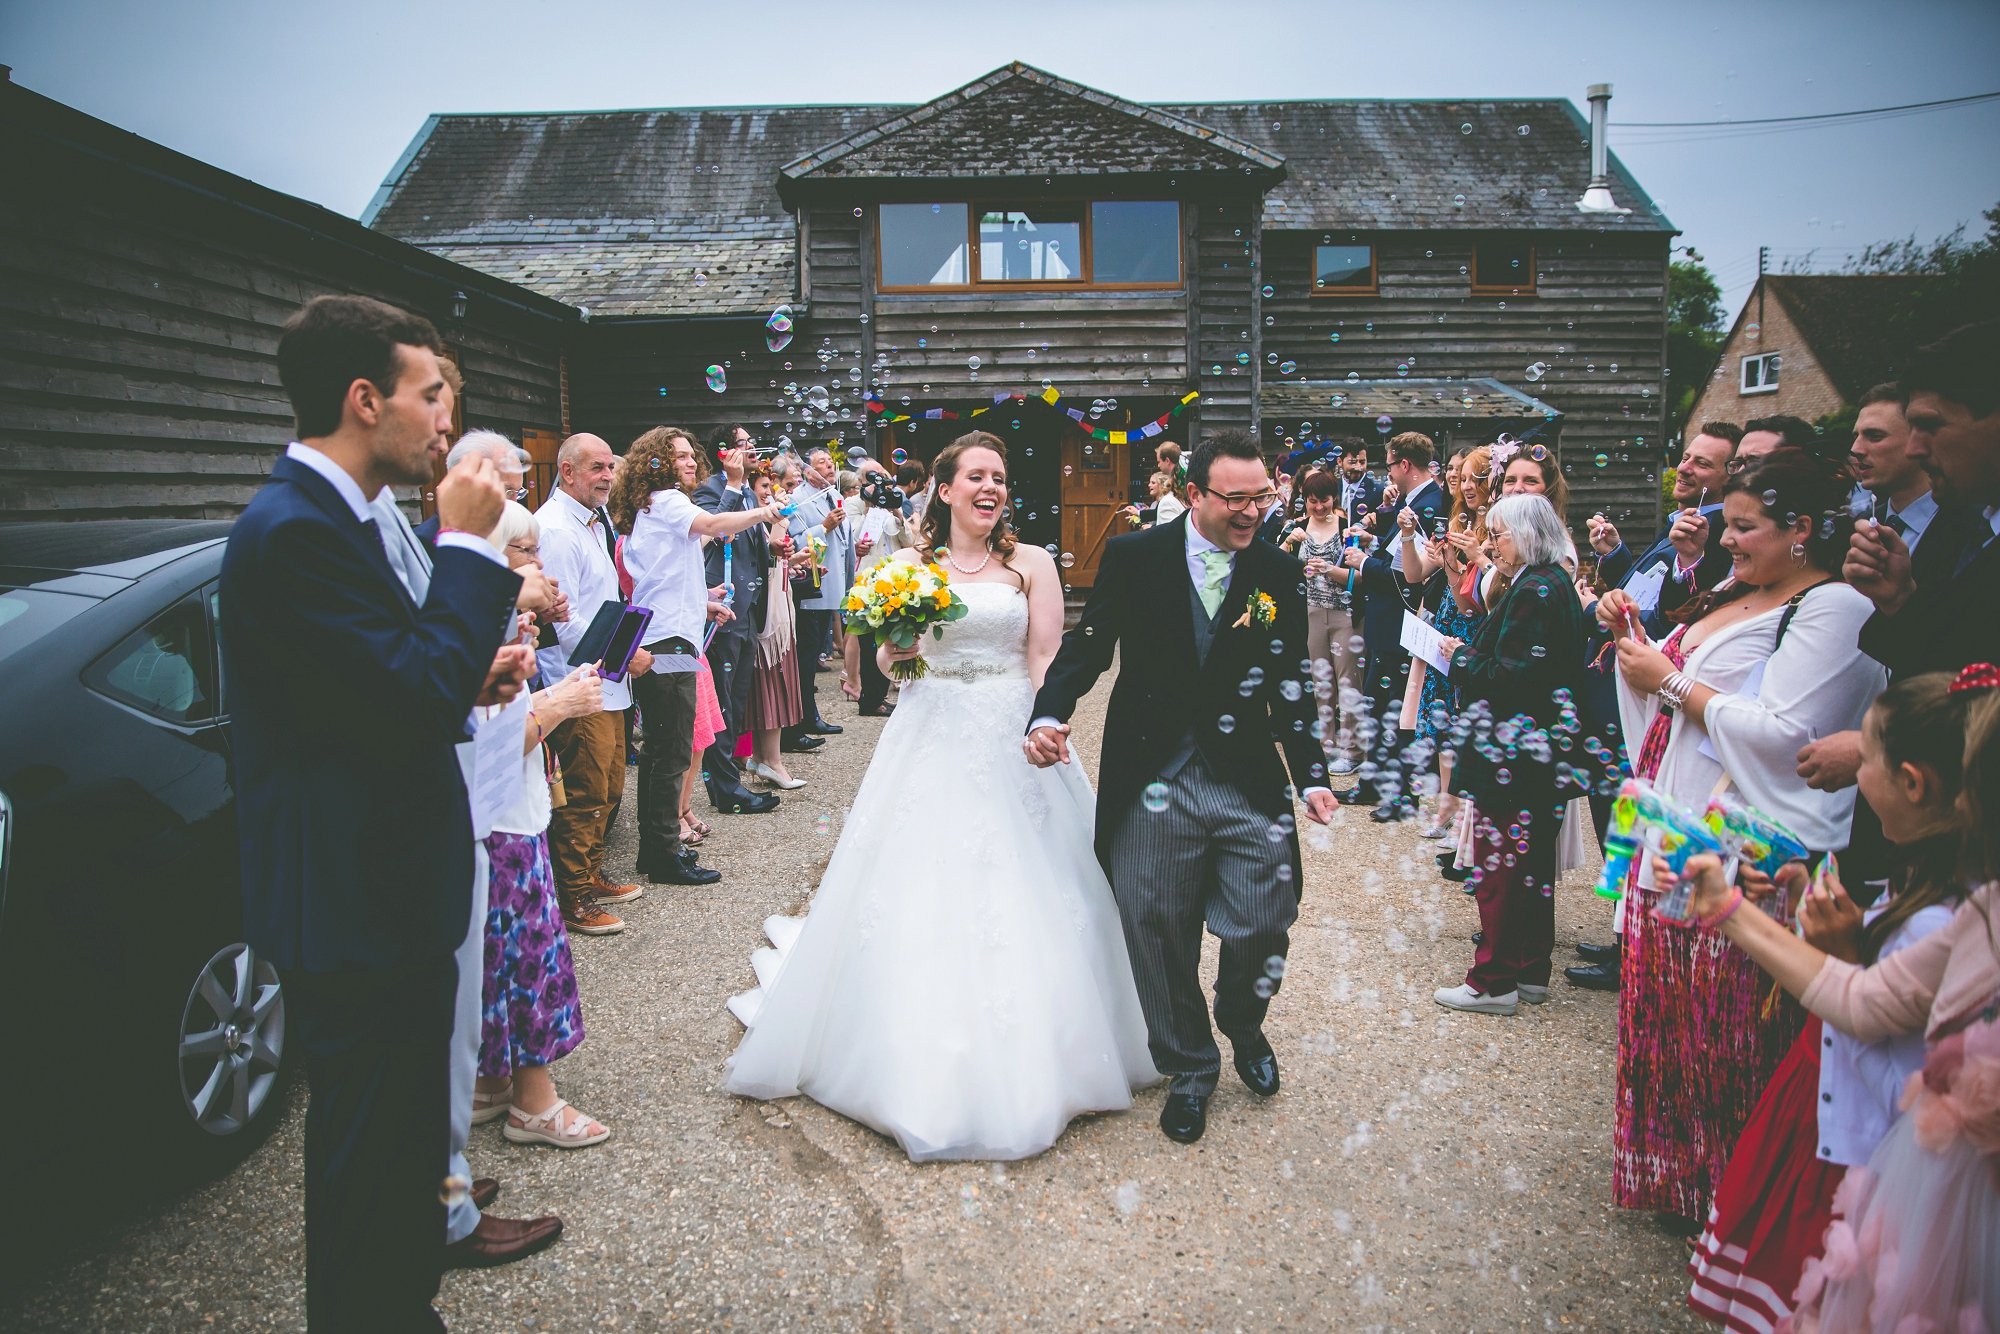 pitt_hall_barn_wedding_0051